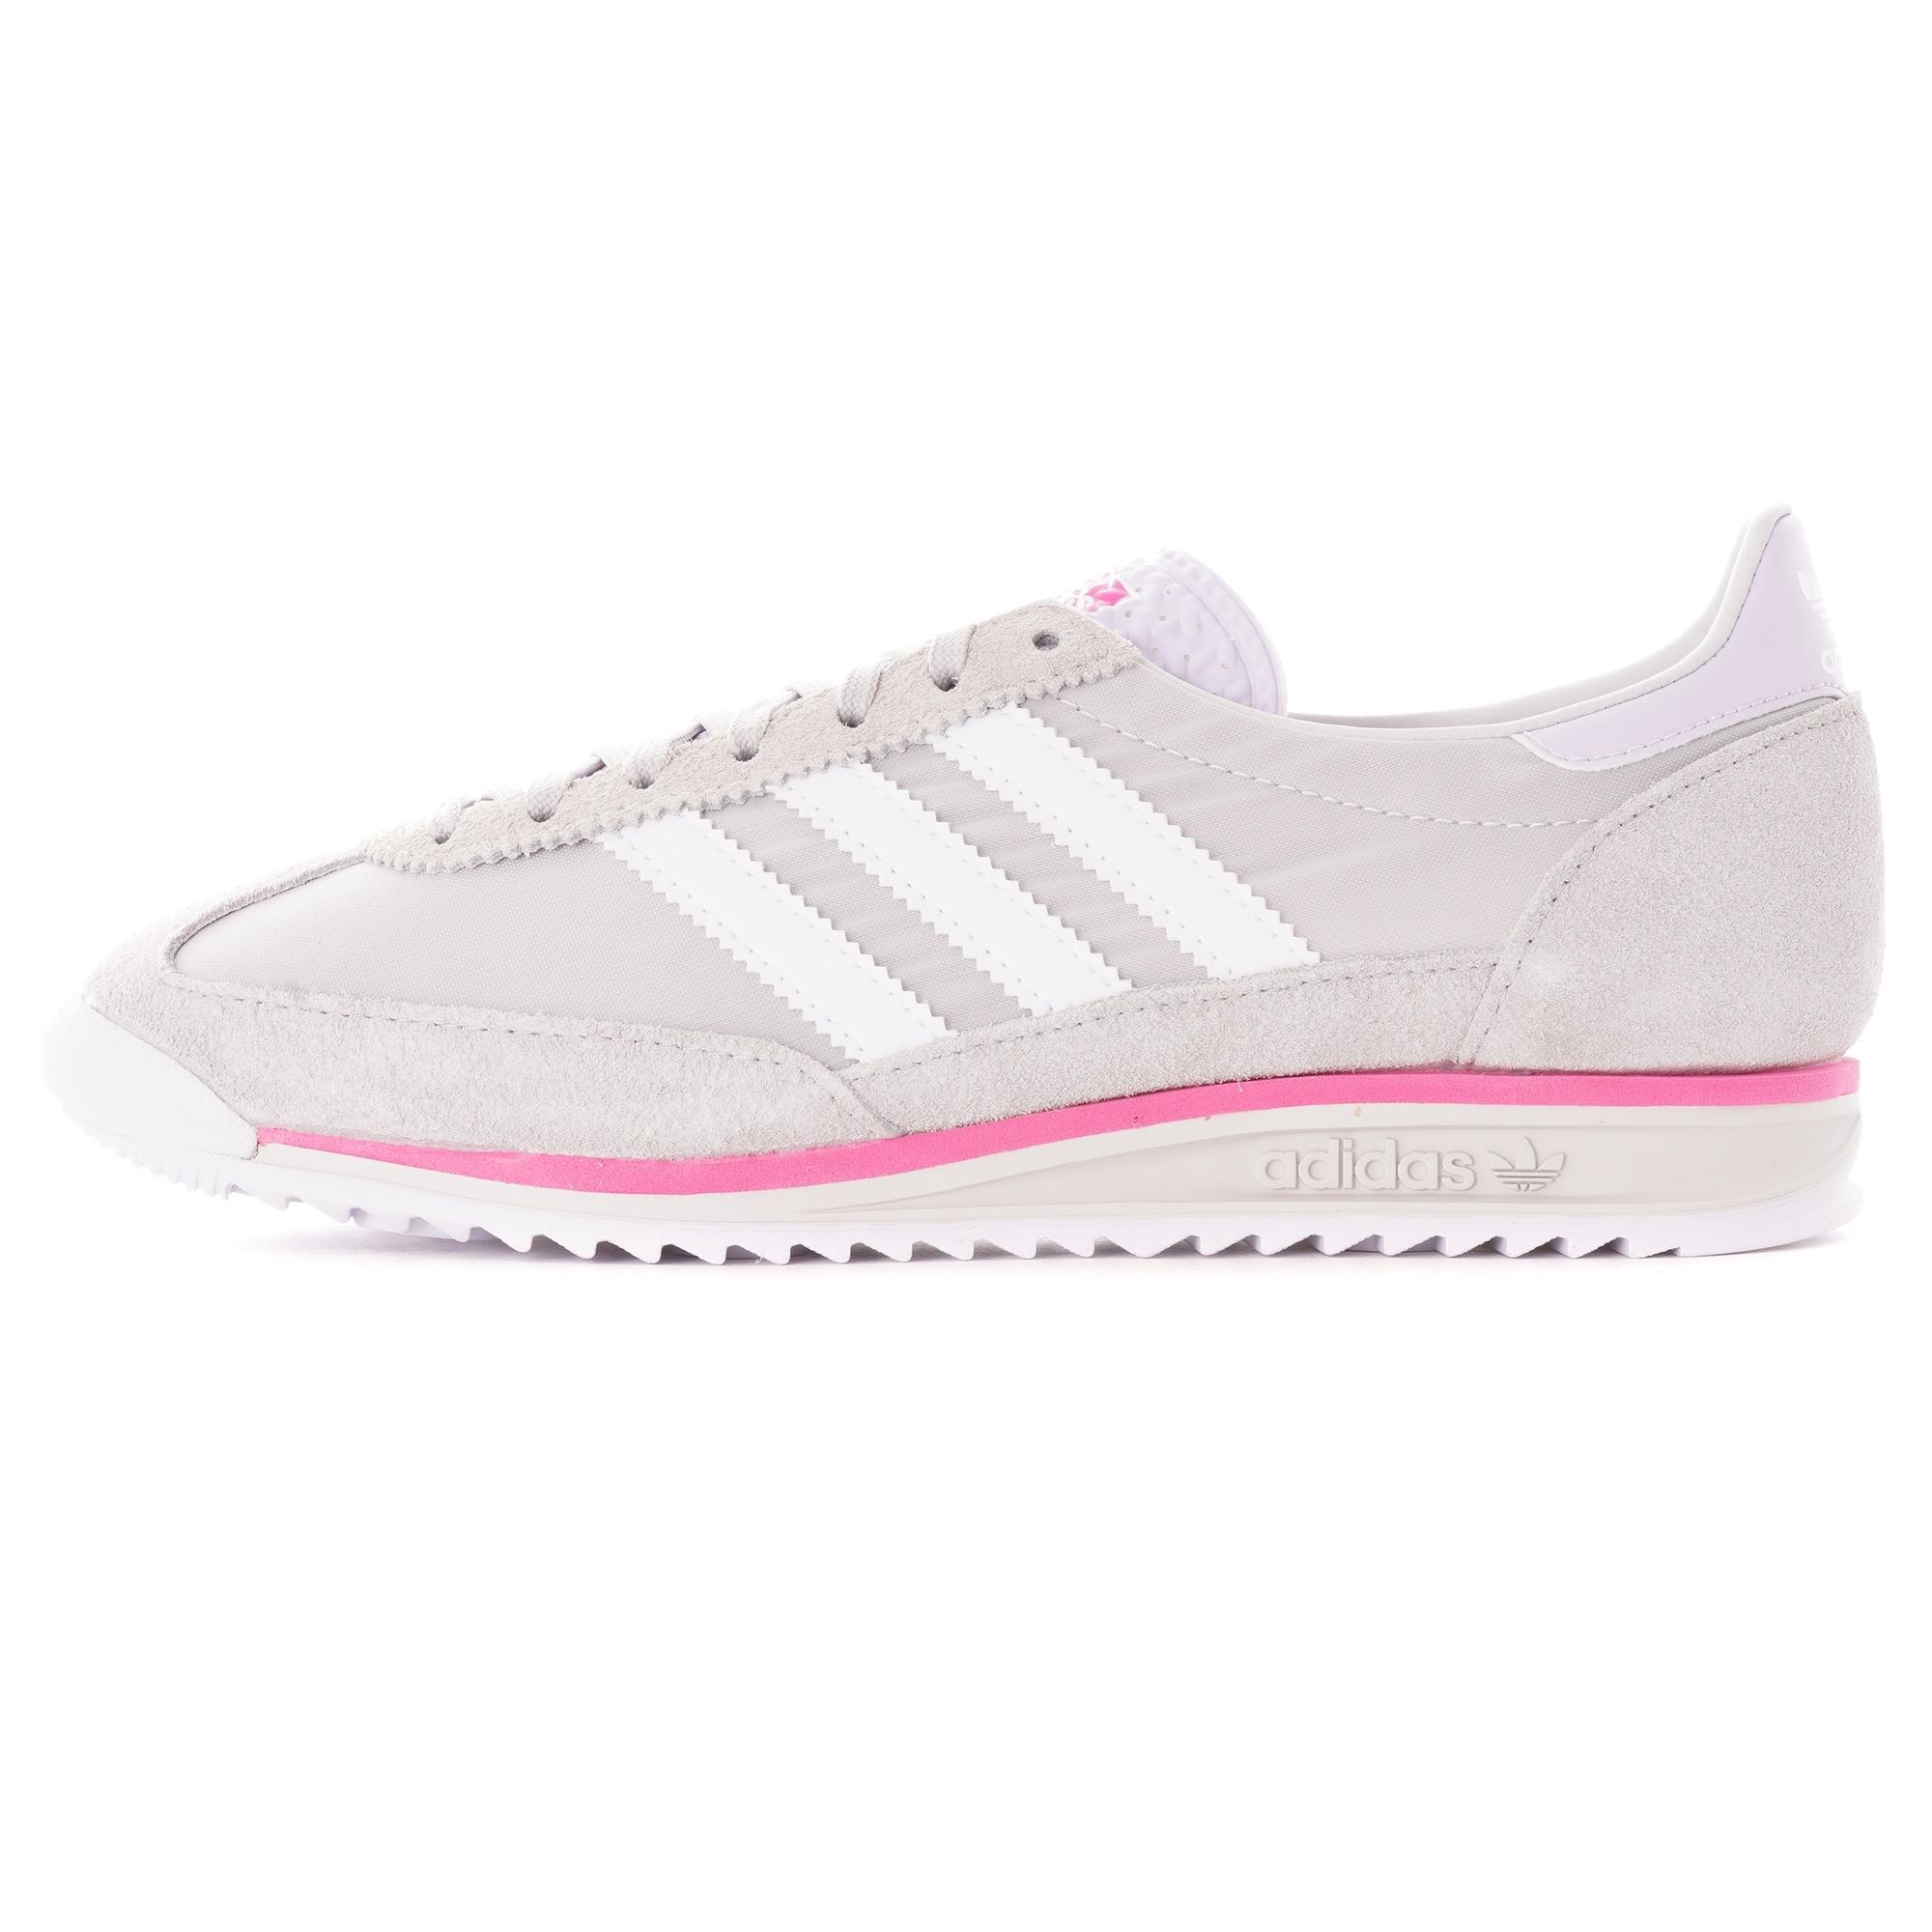 Adidas Original SL 72 Women's Sneakers